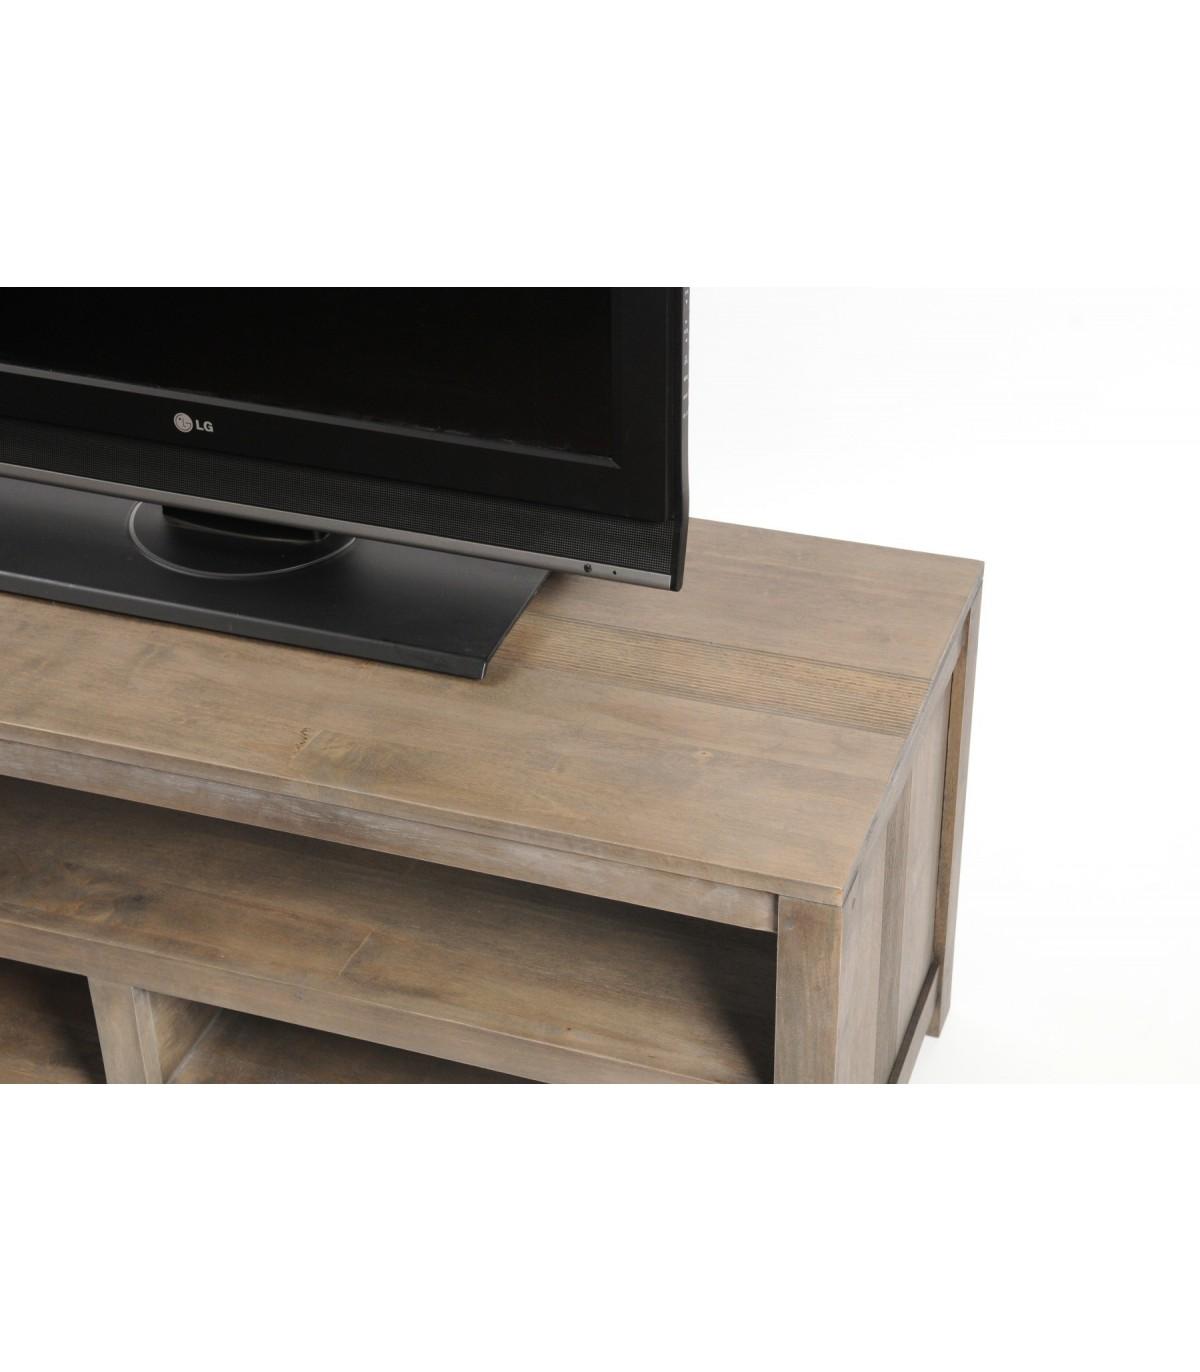 meuble tv bois rangement grand design beldeko pas cher. Black Bedroom Furniture Sets. Home Design Ideas